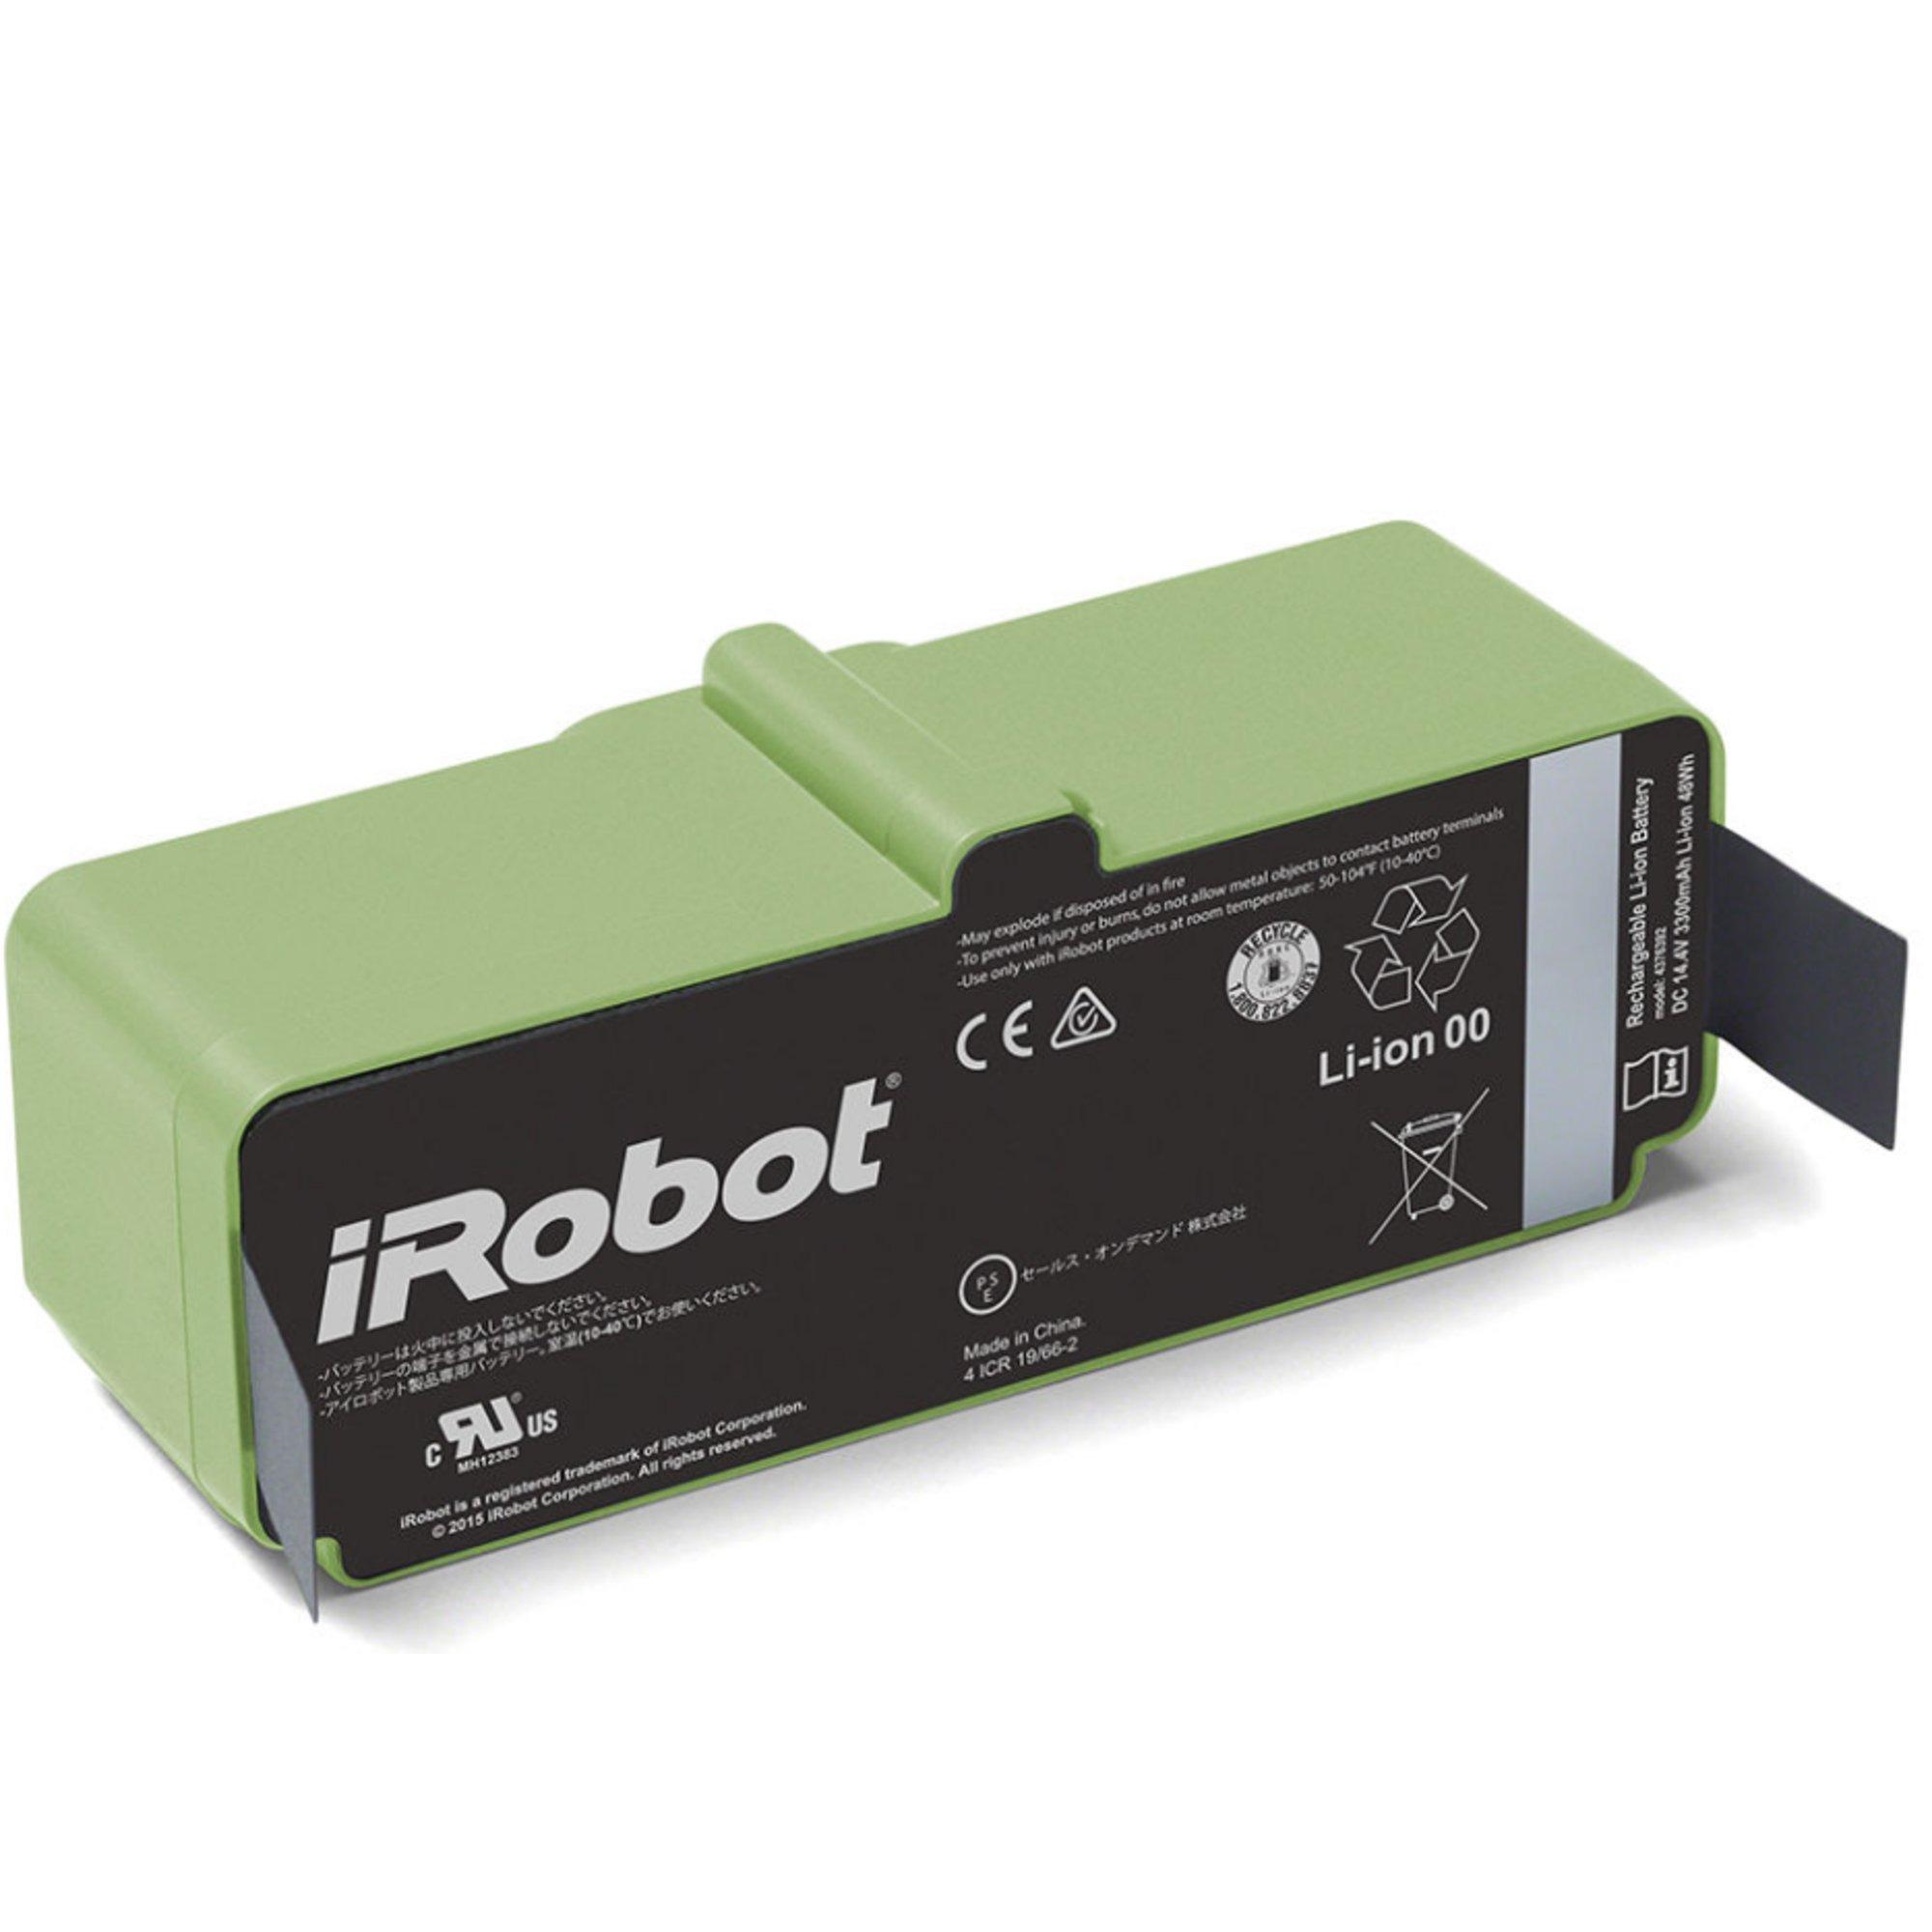 iRobot Roomba 3300 lithium-ion